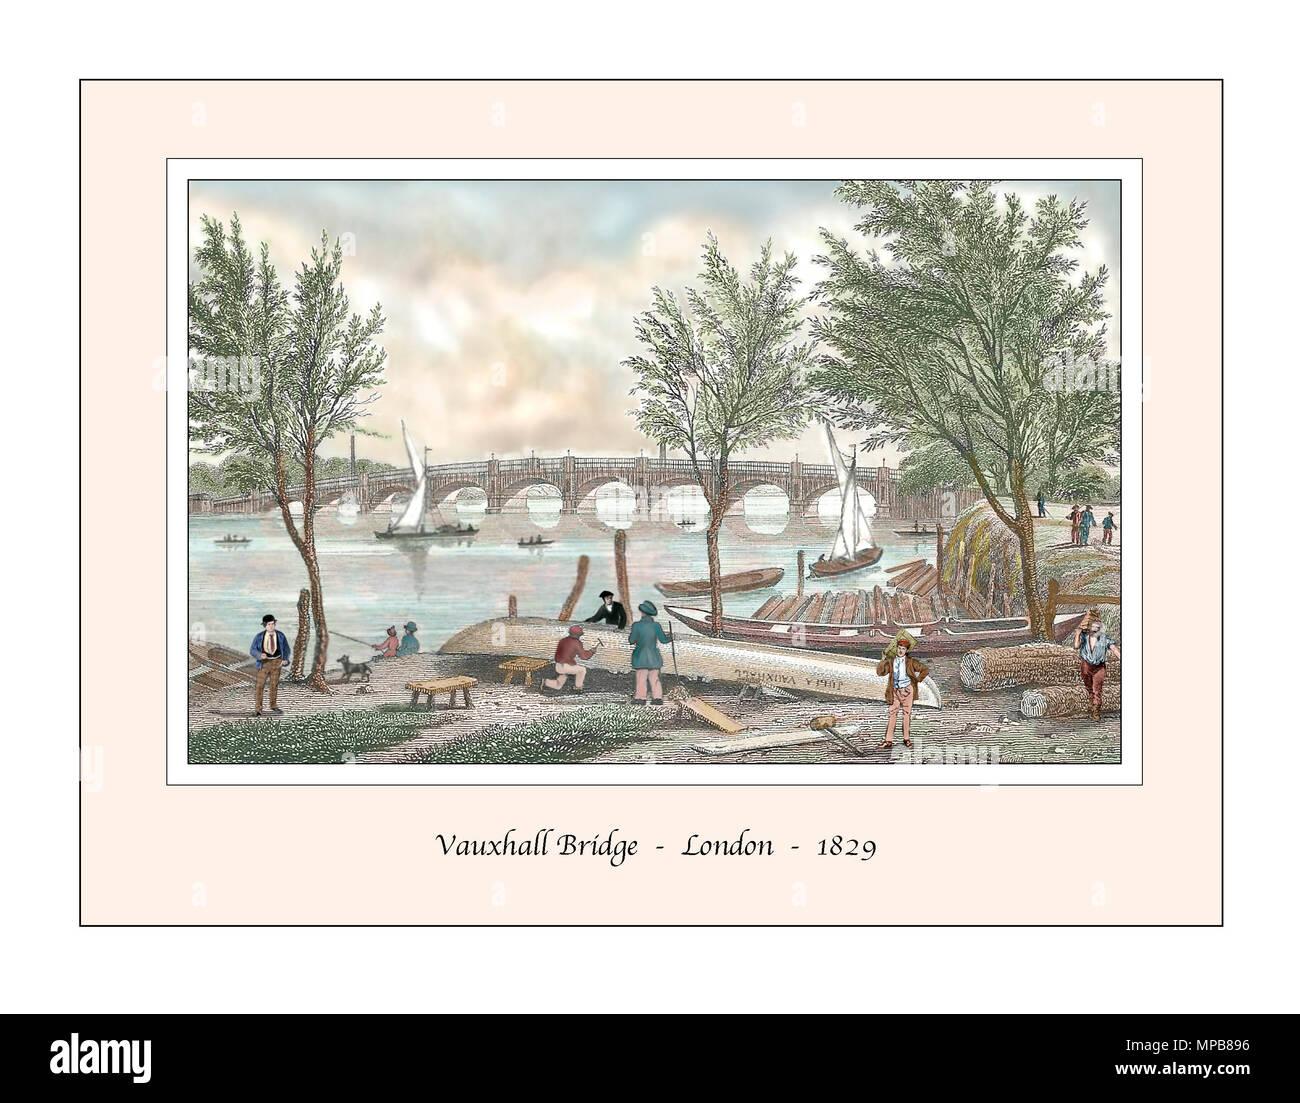 Vauxhall Bridge London Original Design based on a 19th century Engraving - Stock Image